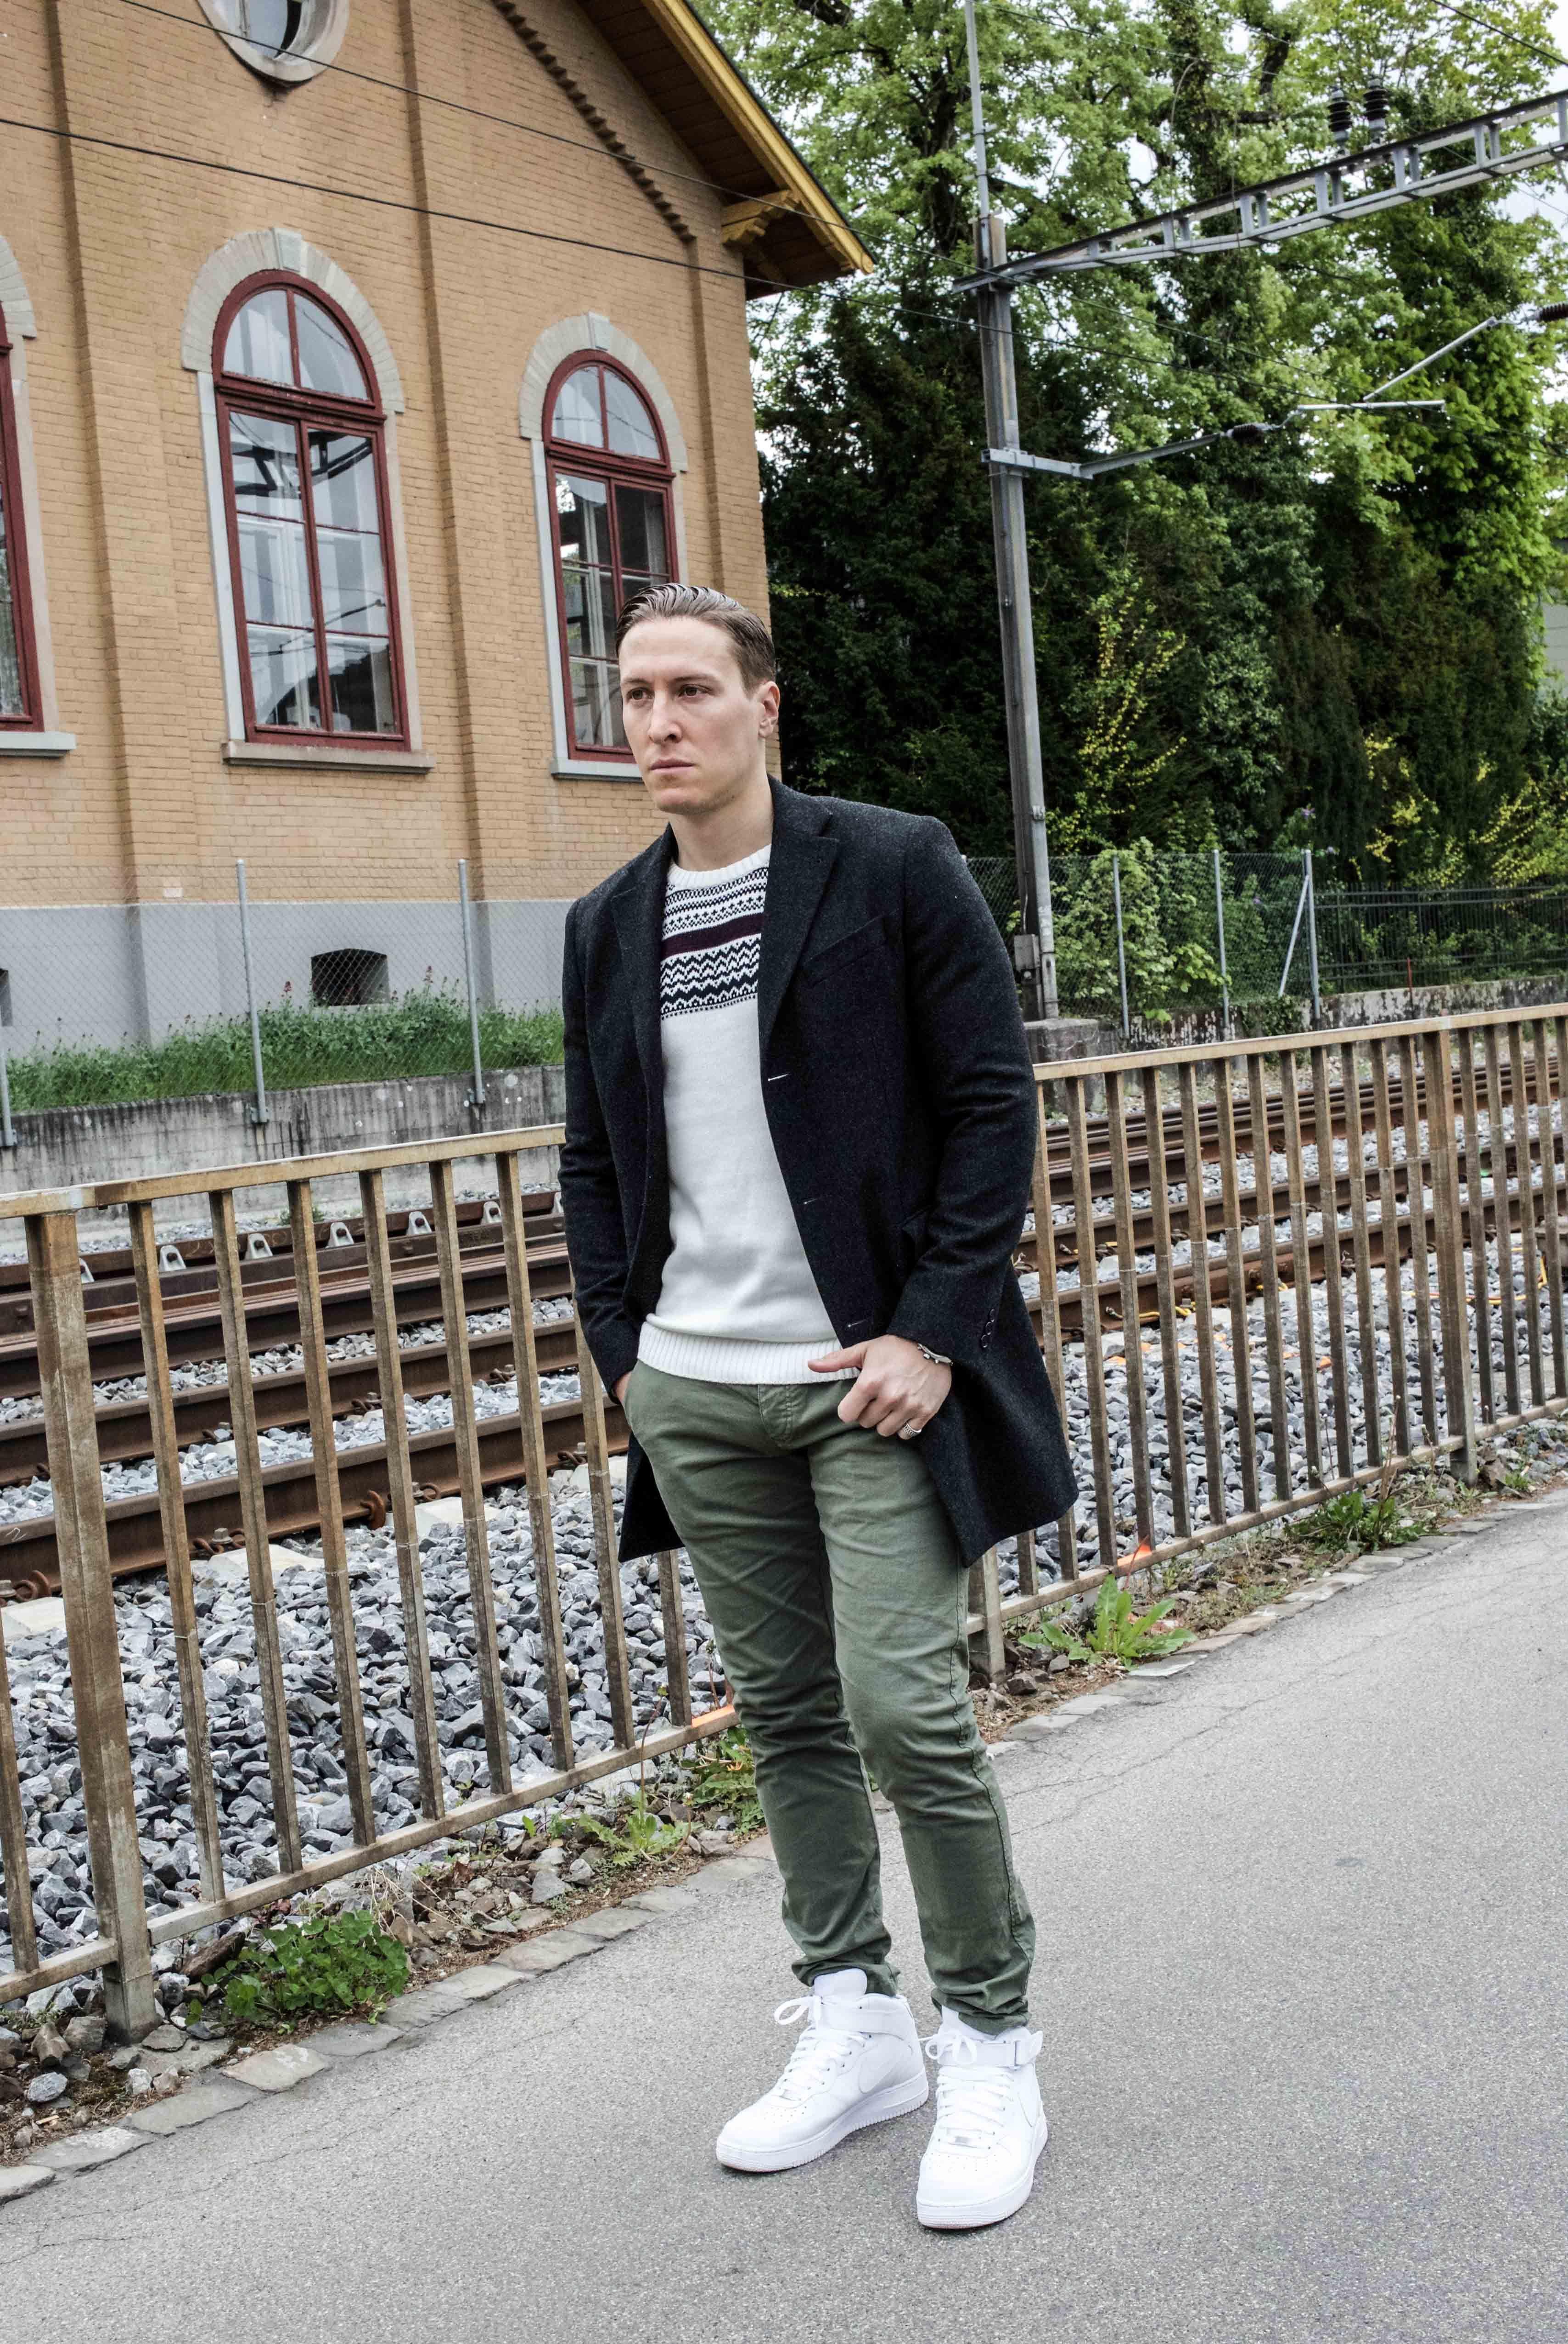 Inspirierend Grauer Mantel Kombinieren Beste Wahl Streetstyle Zürich: Nike Air Force, Grüne Chino,